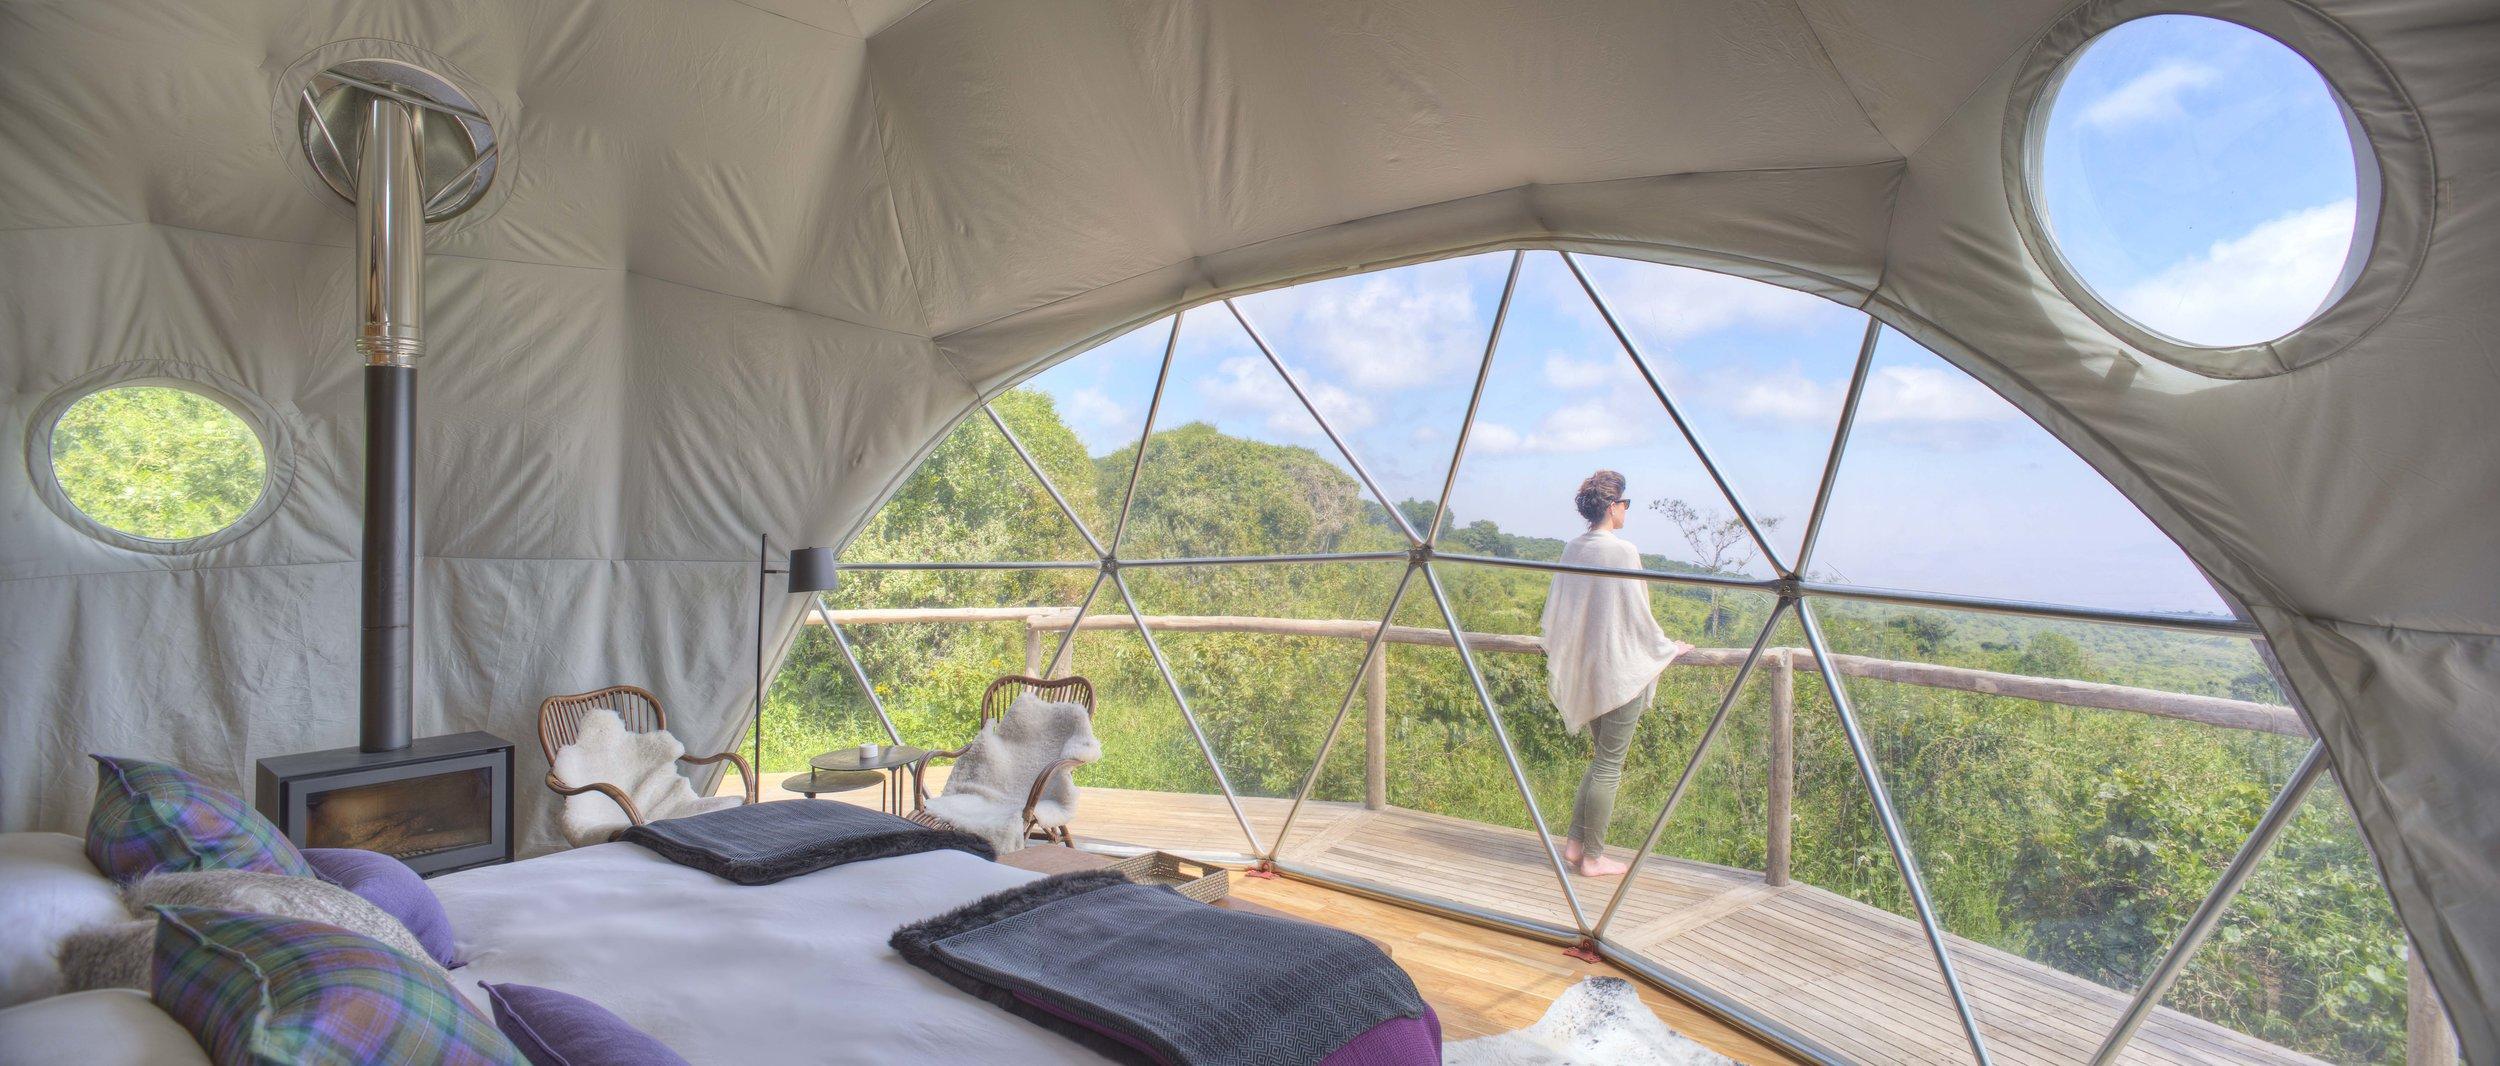 selous safari tanzania